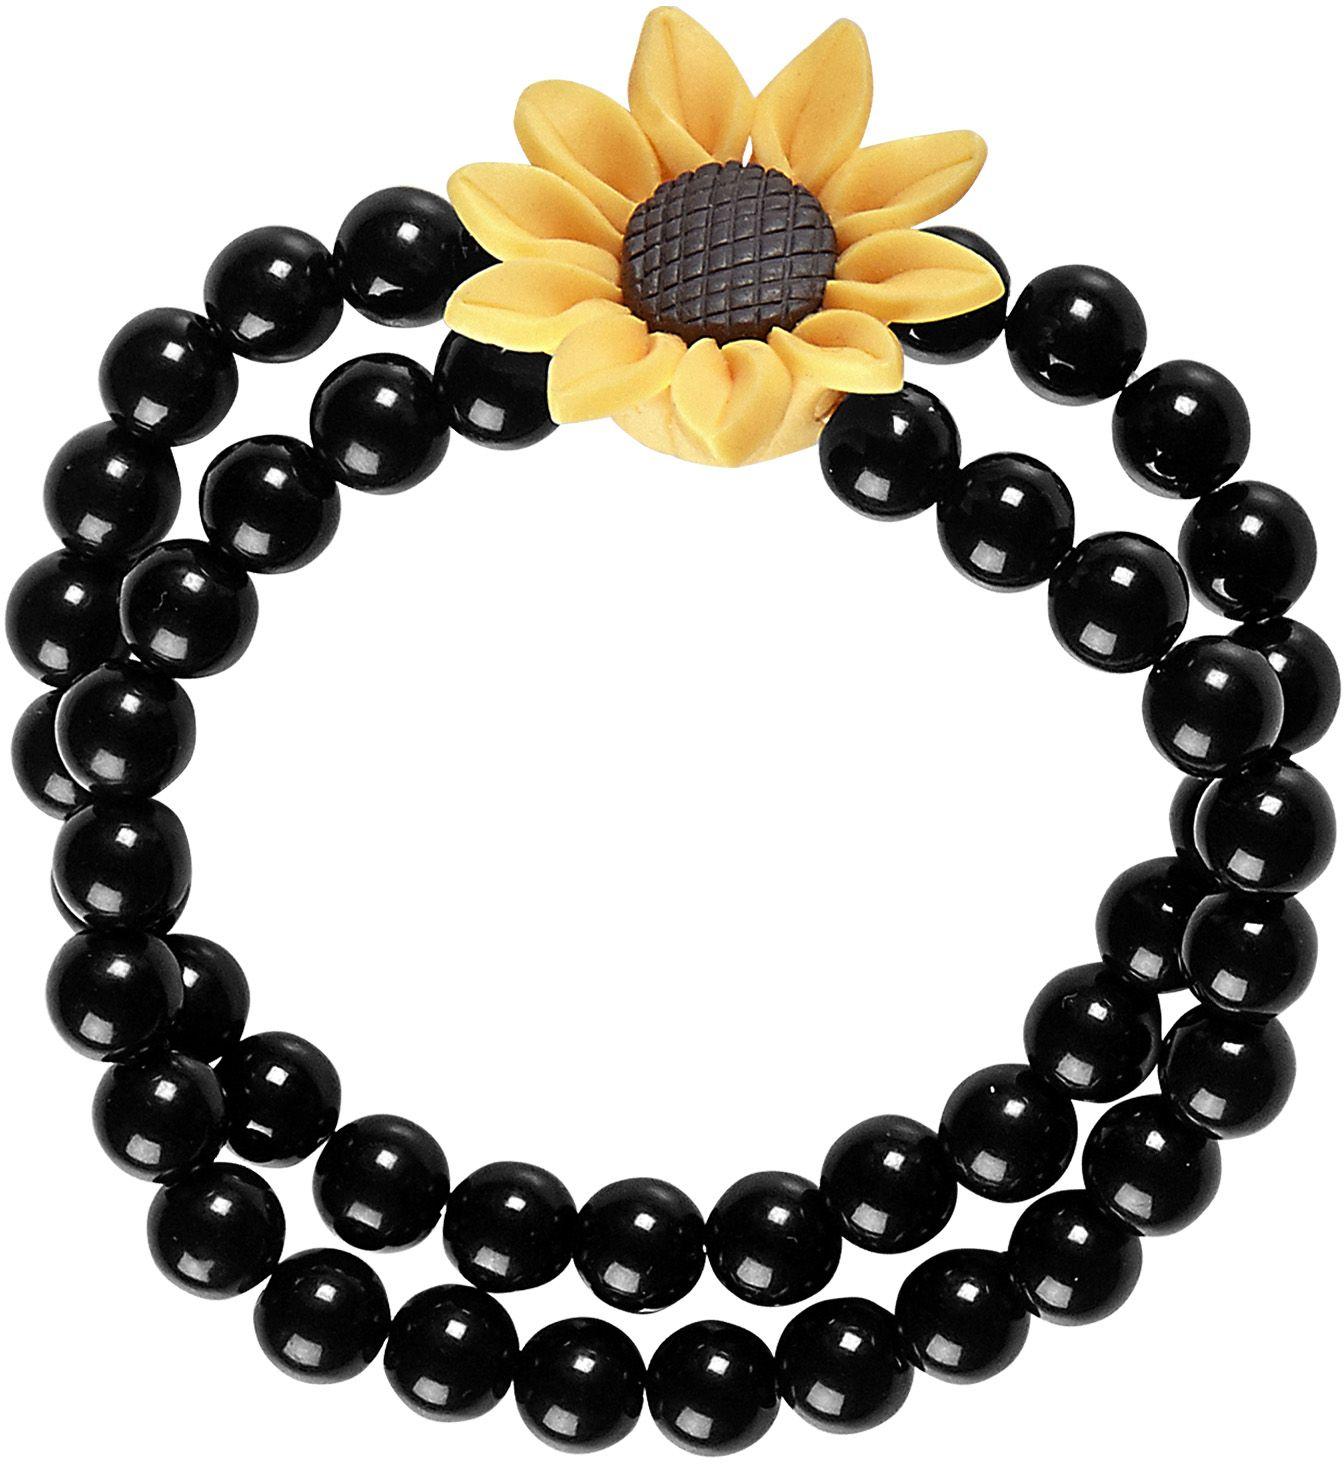 Hippie zonnebloem armband dames